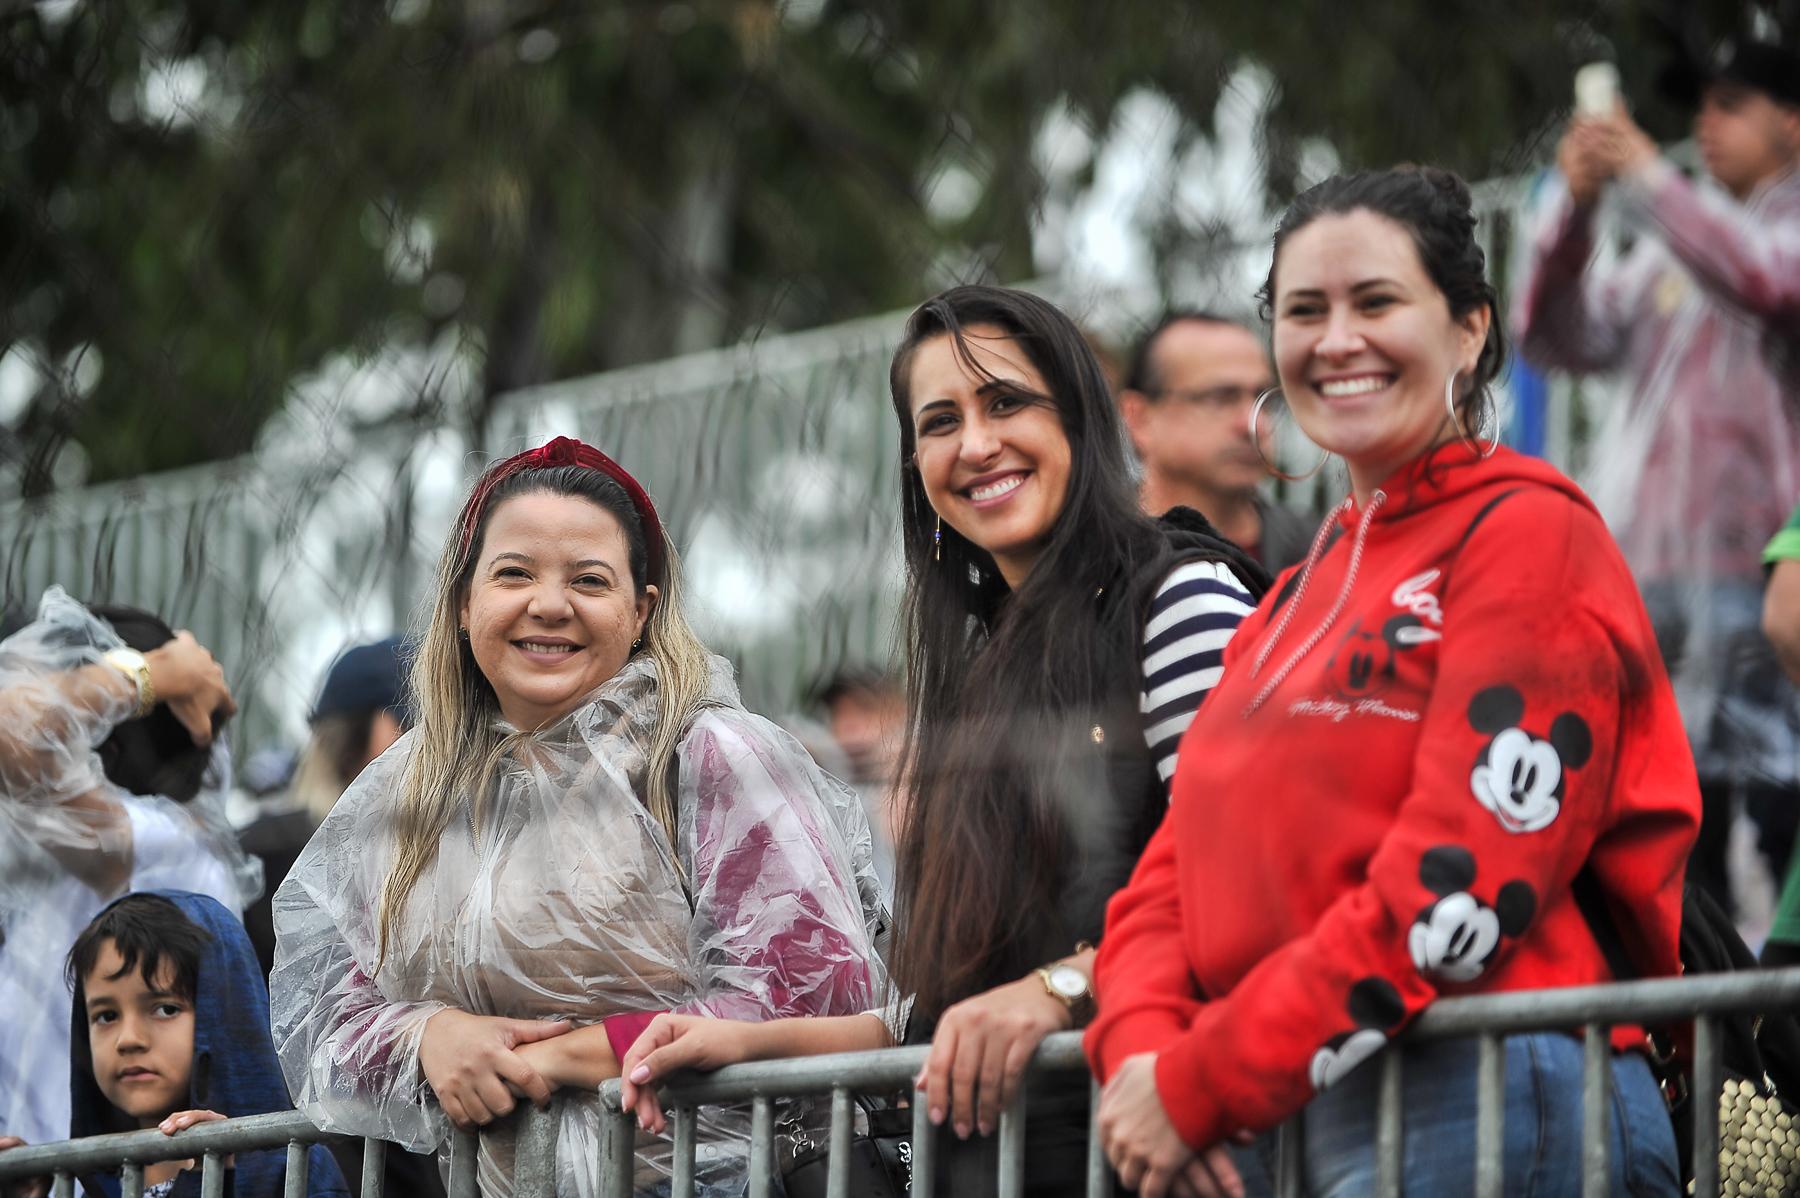 03_CopaTruck2019_dudabairros_Londrina_04